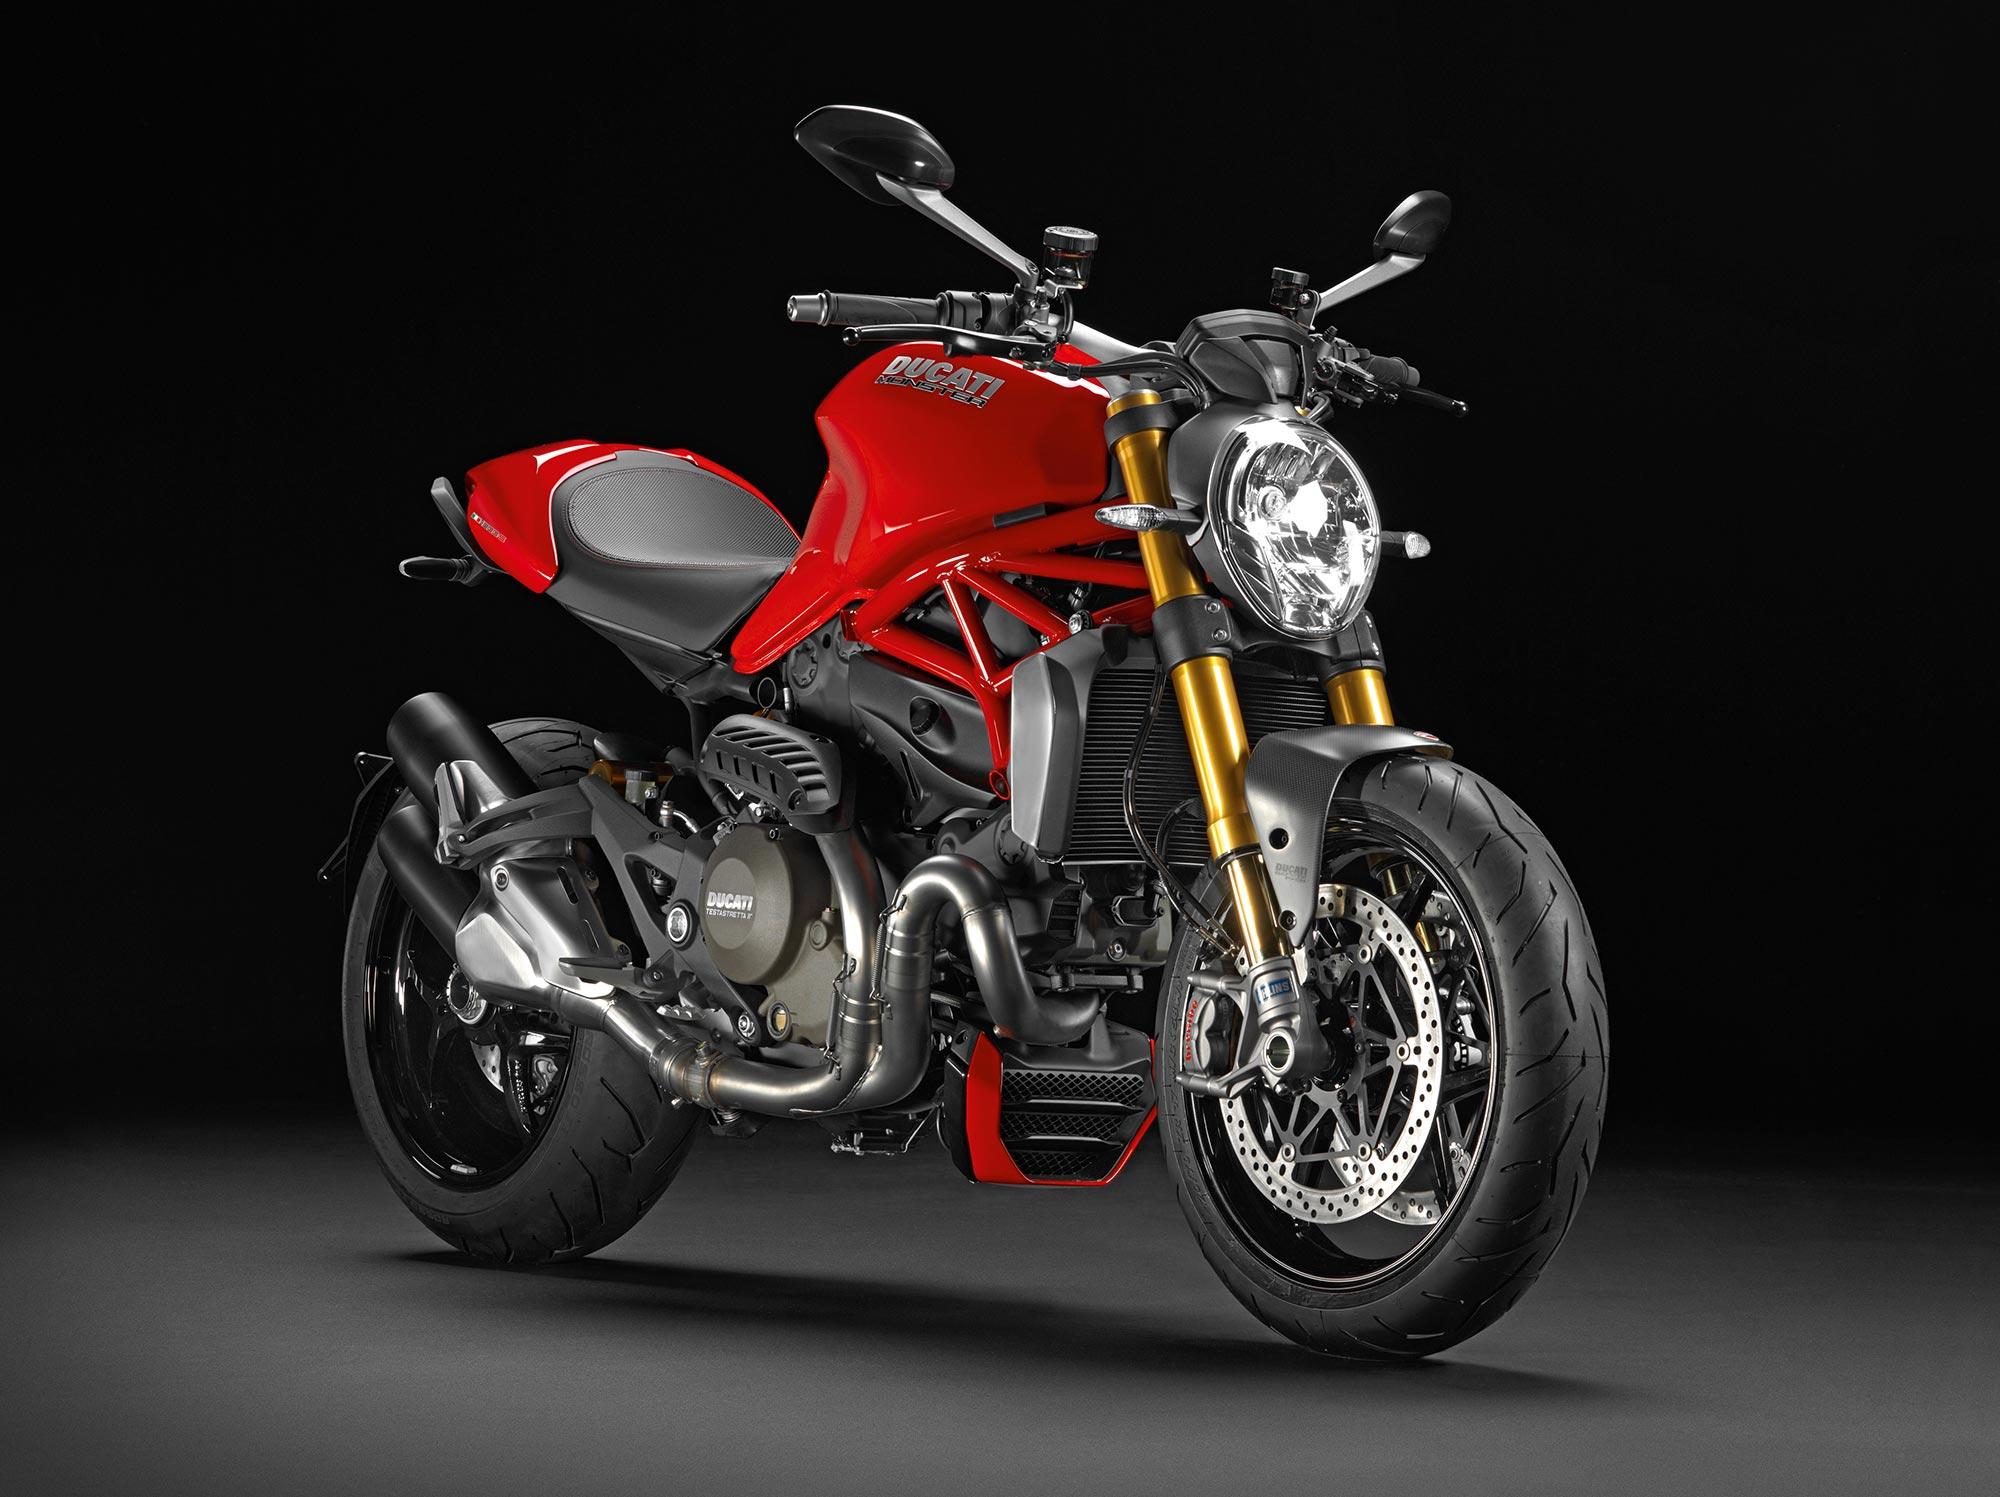 2014 Ducati ... Ducati Monster 1200s